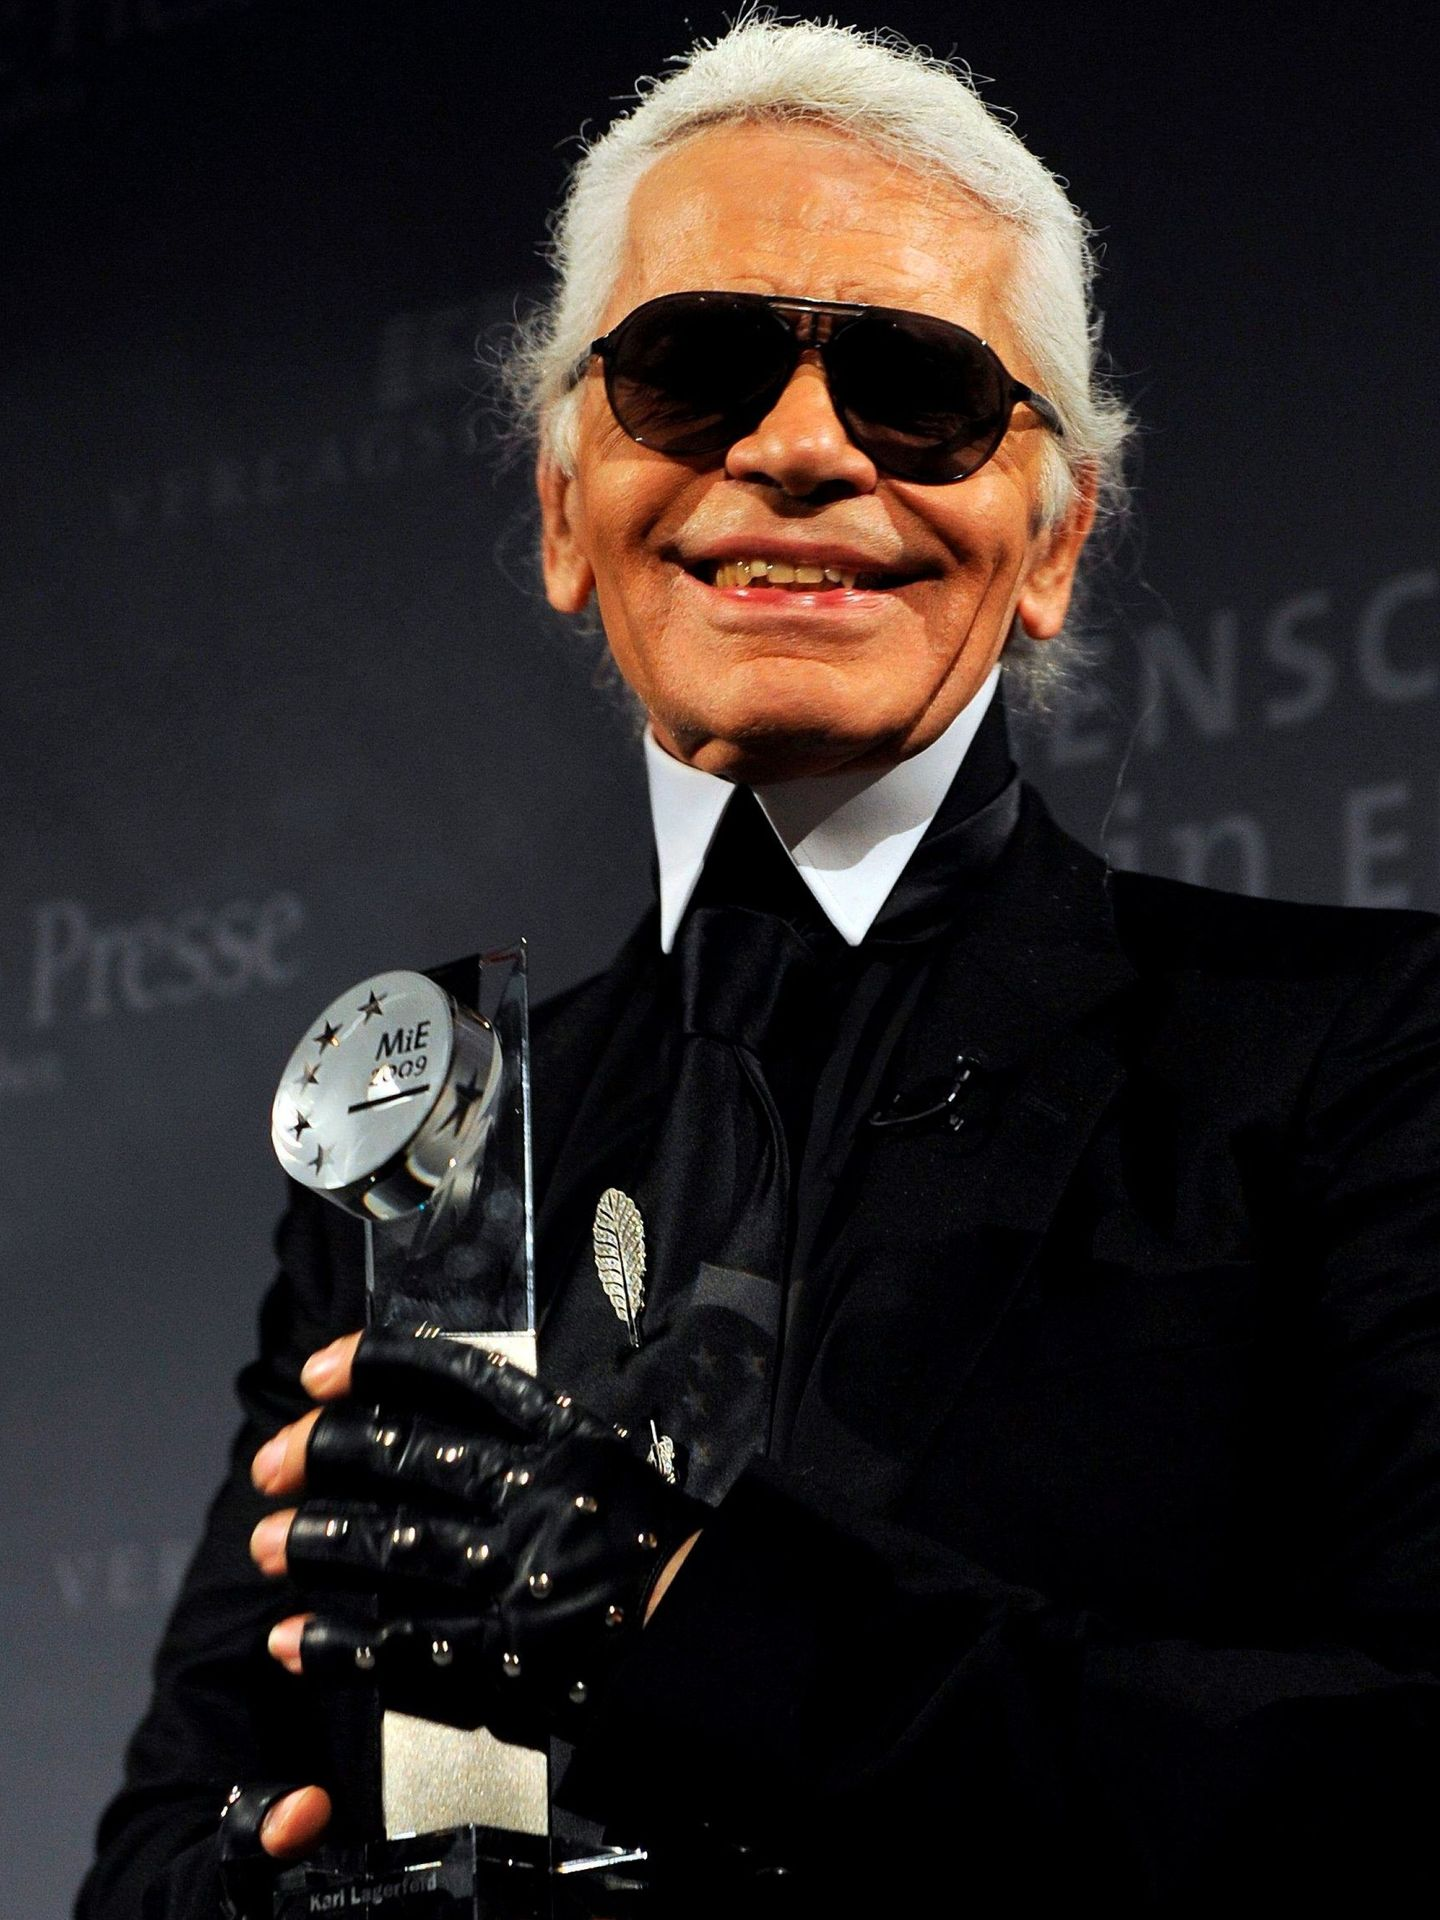 Karl Lagerfeld posa con el premio Menschen-in-Europa Award. (EFE)